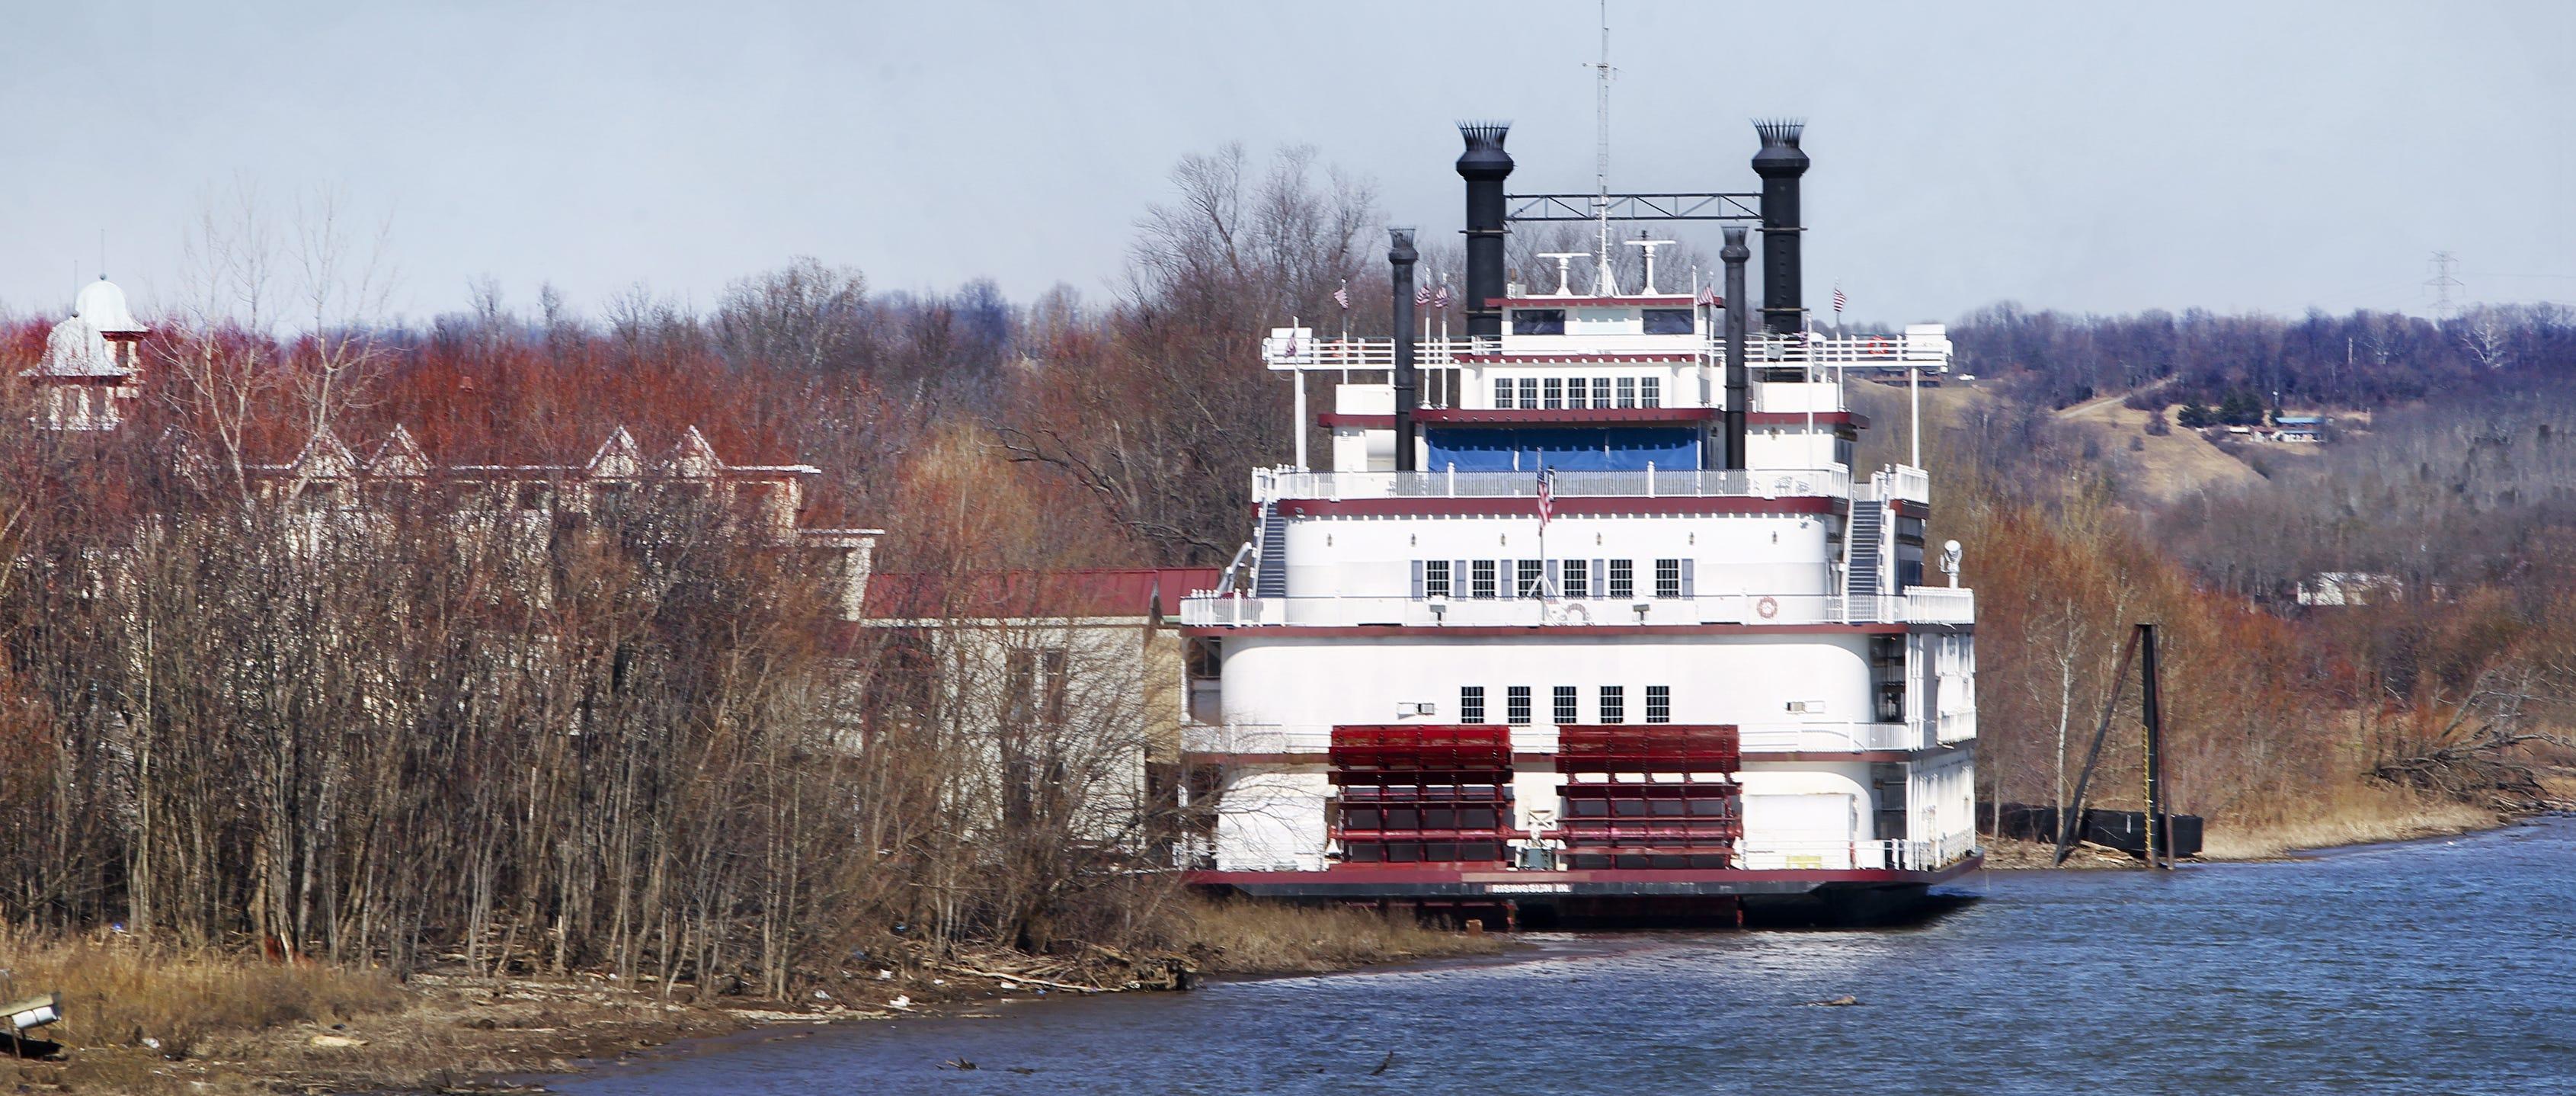 Boat casino gambling indiana harrahs north county casino